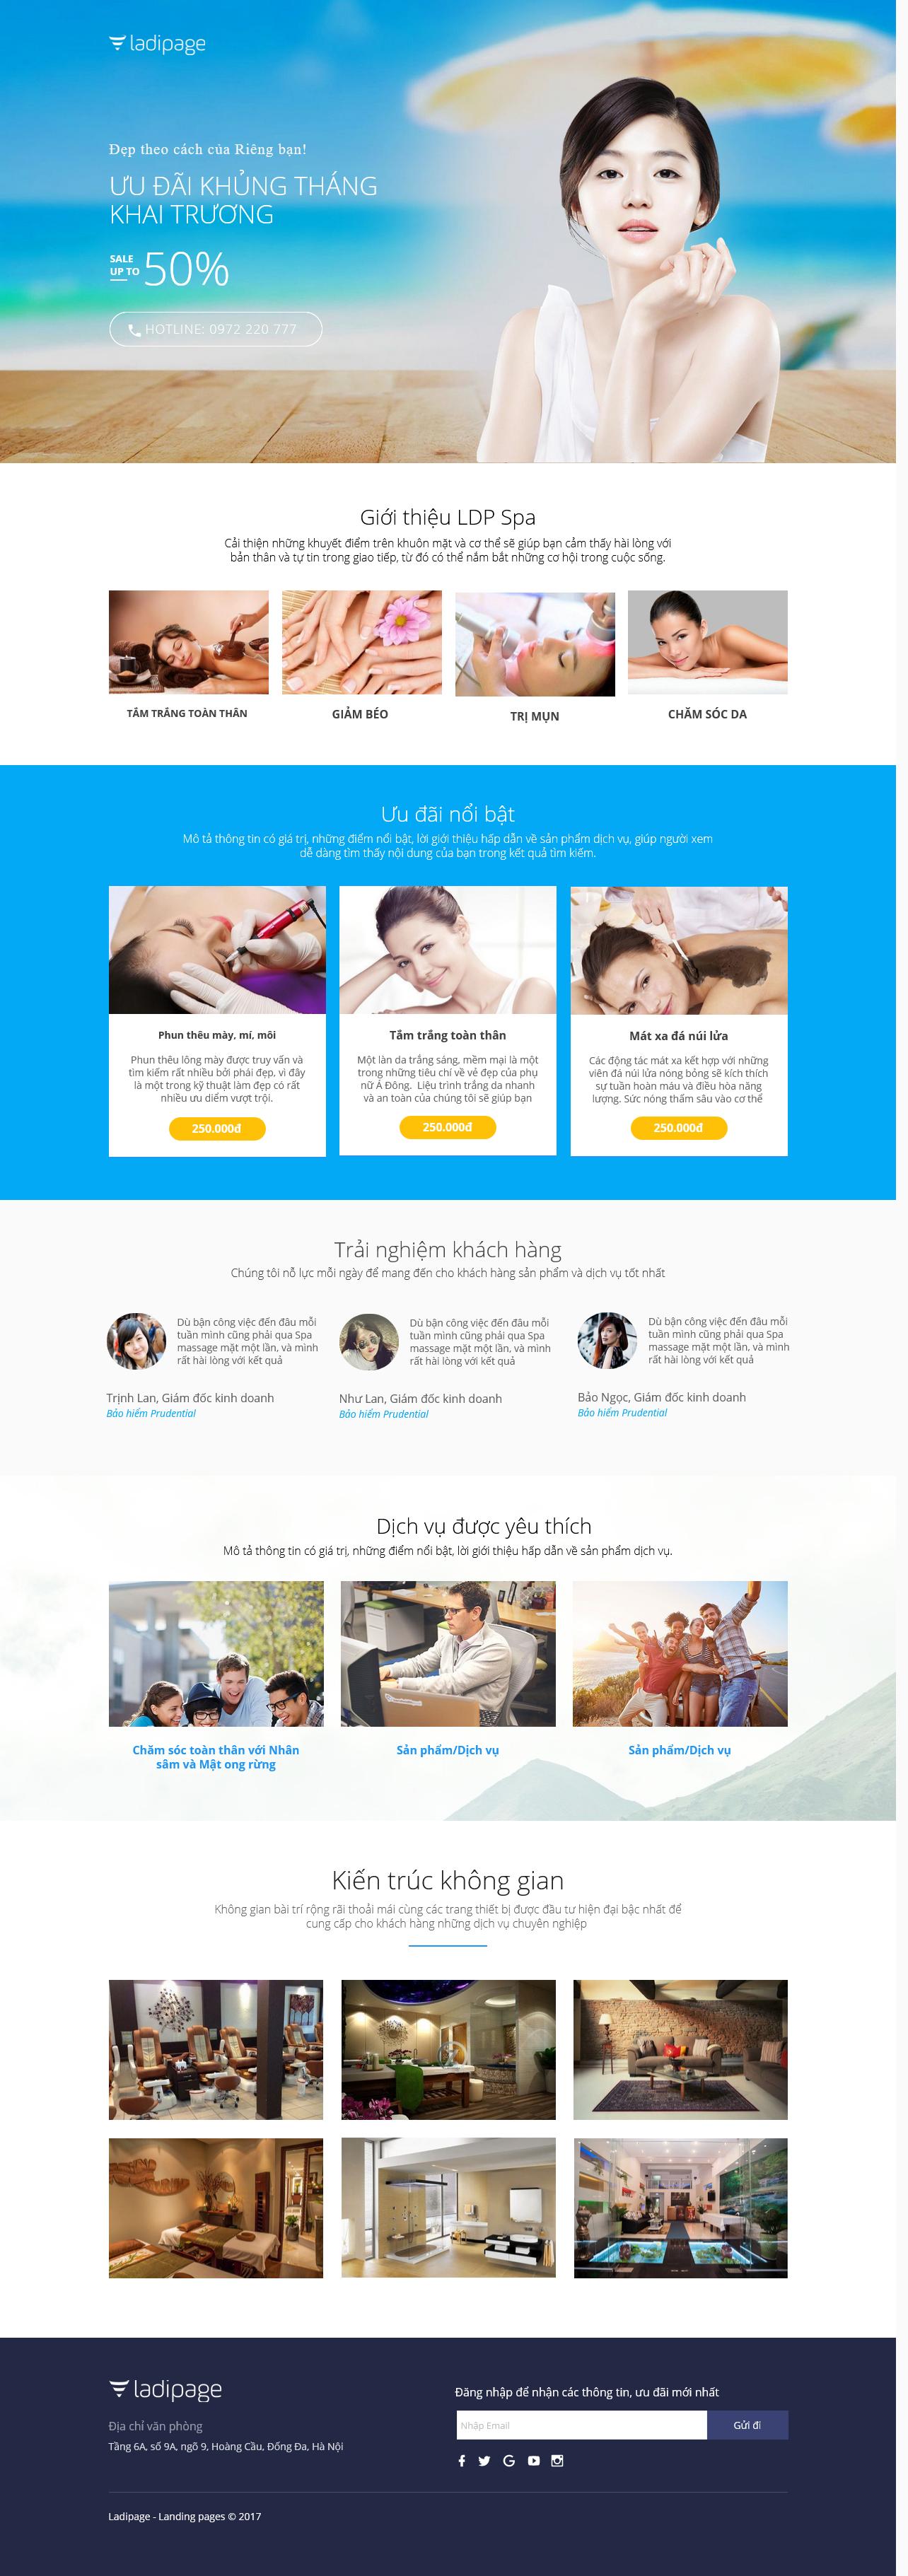 Thiết kế website Thiết kế webiste landingpage tham-my---spa---lam-dep Sức khỏe/làm đẹp 01